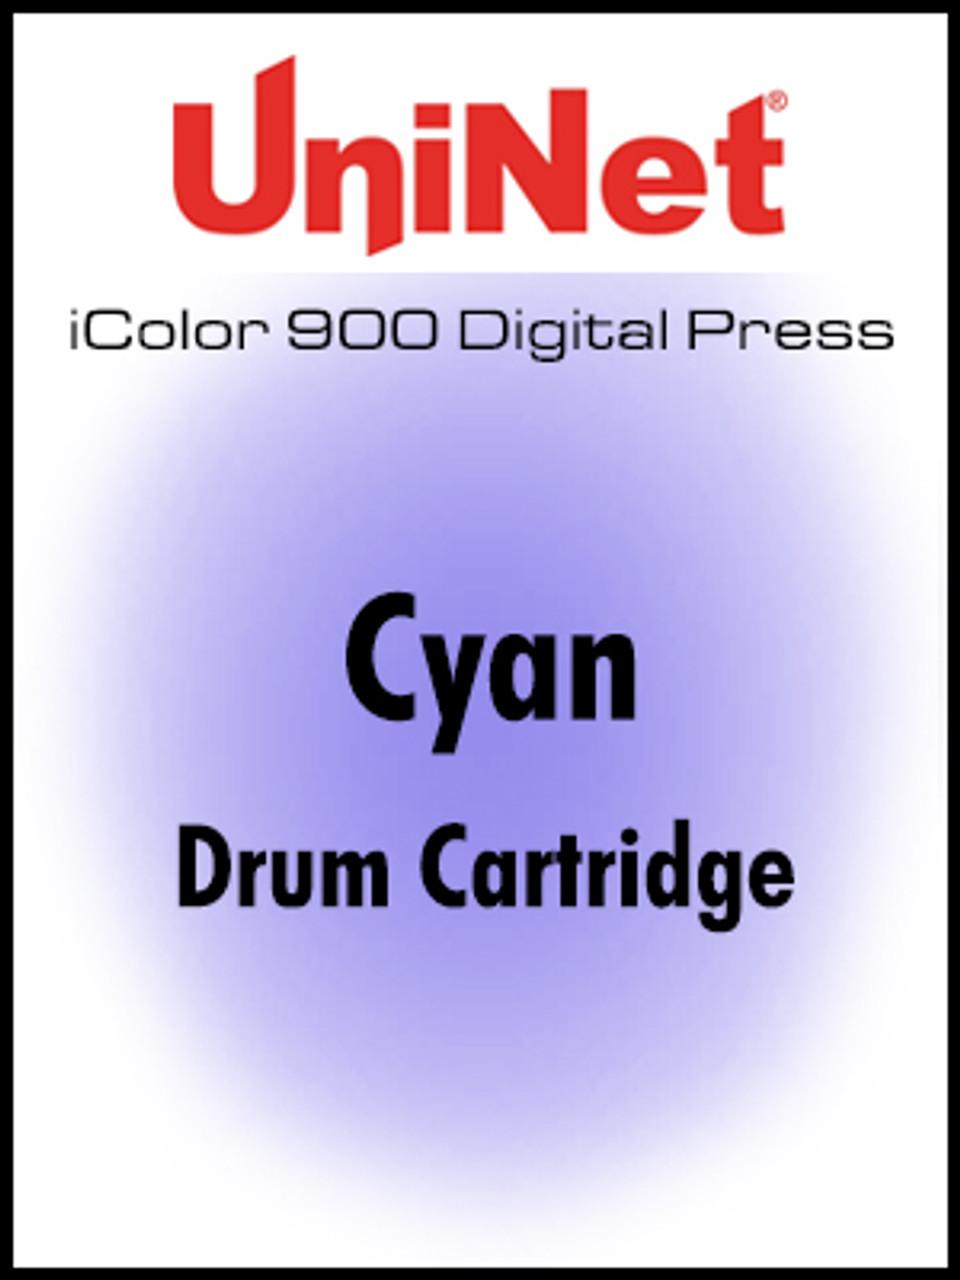 iColor 900 Digital Press Cyan drum cartridge